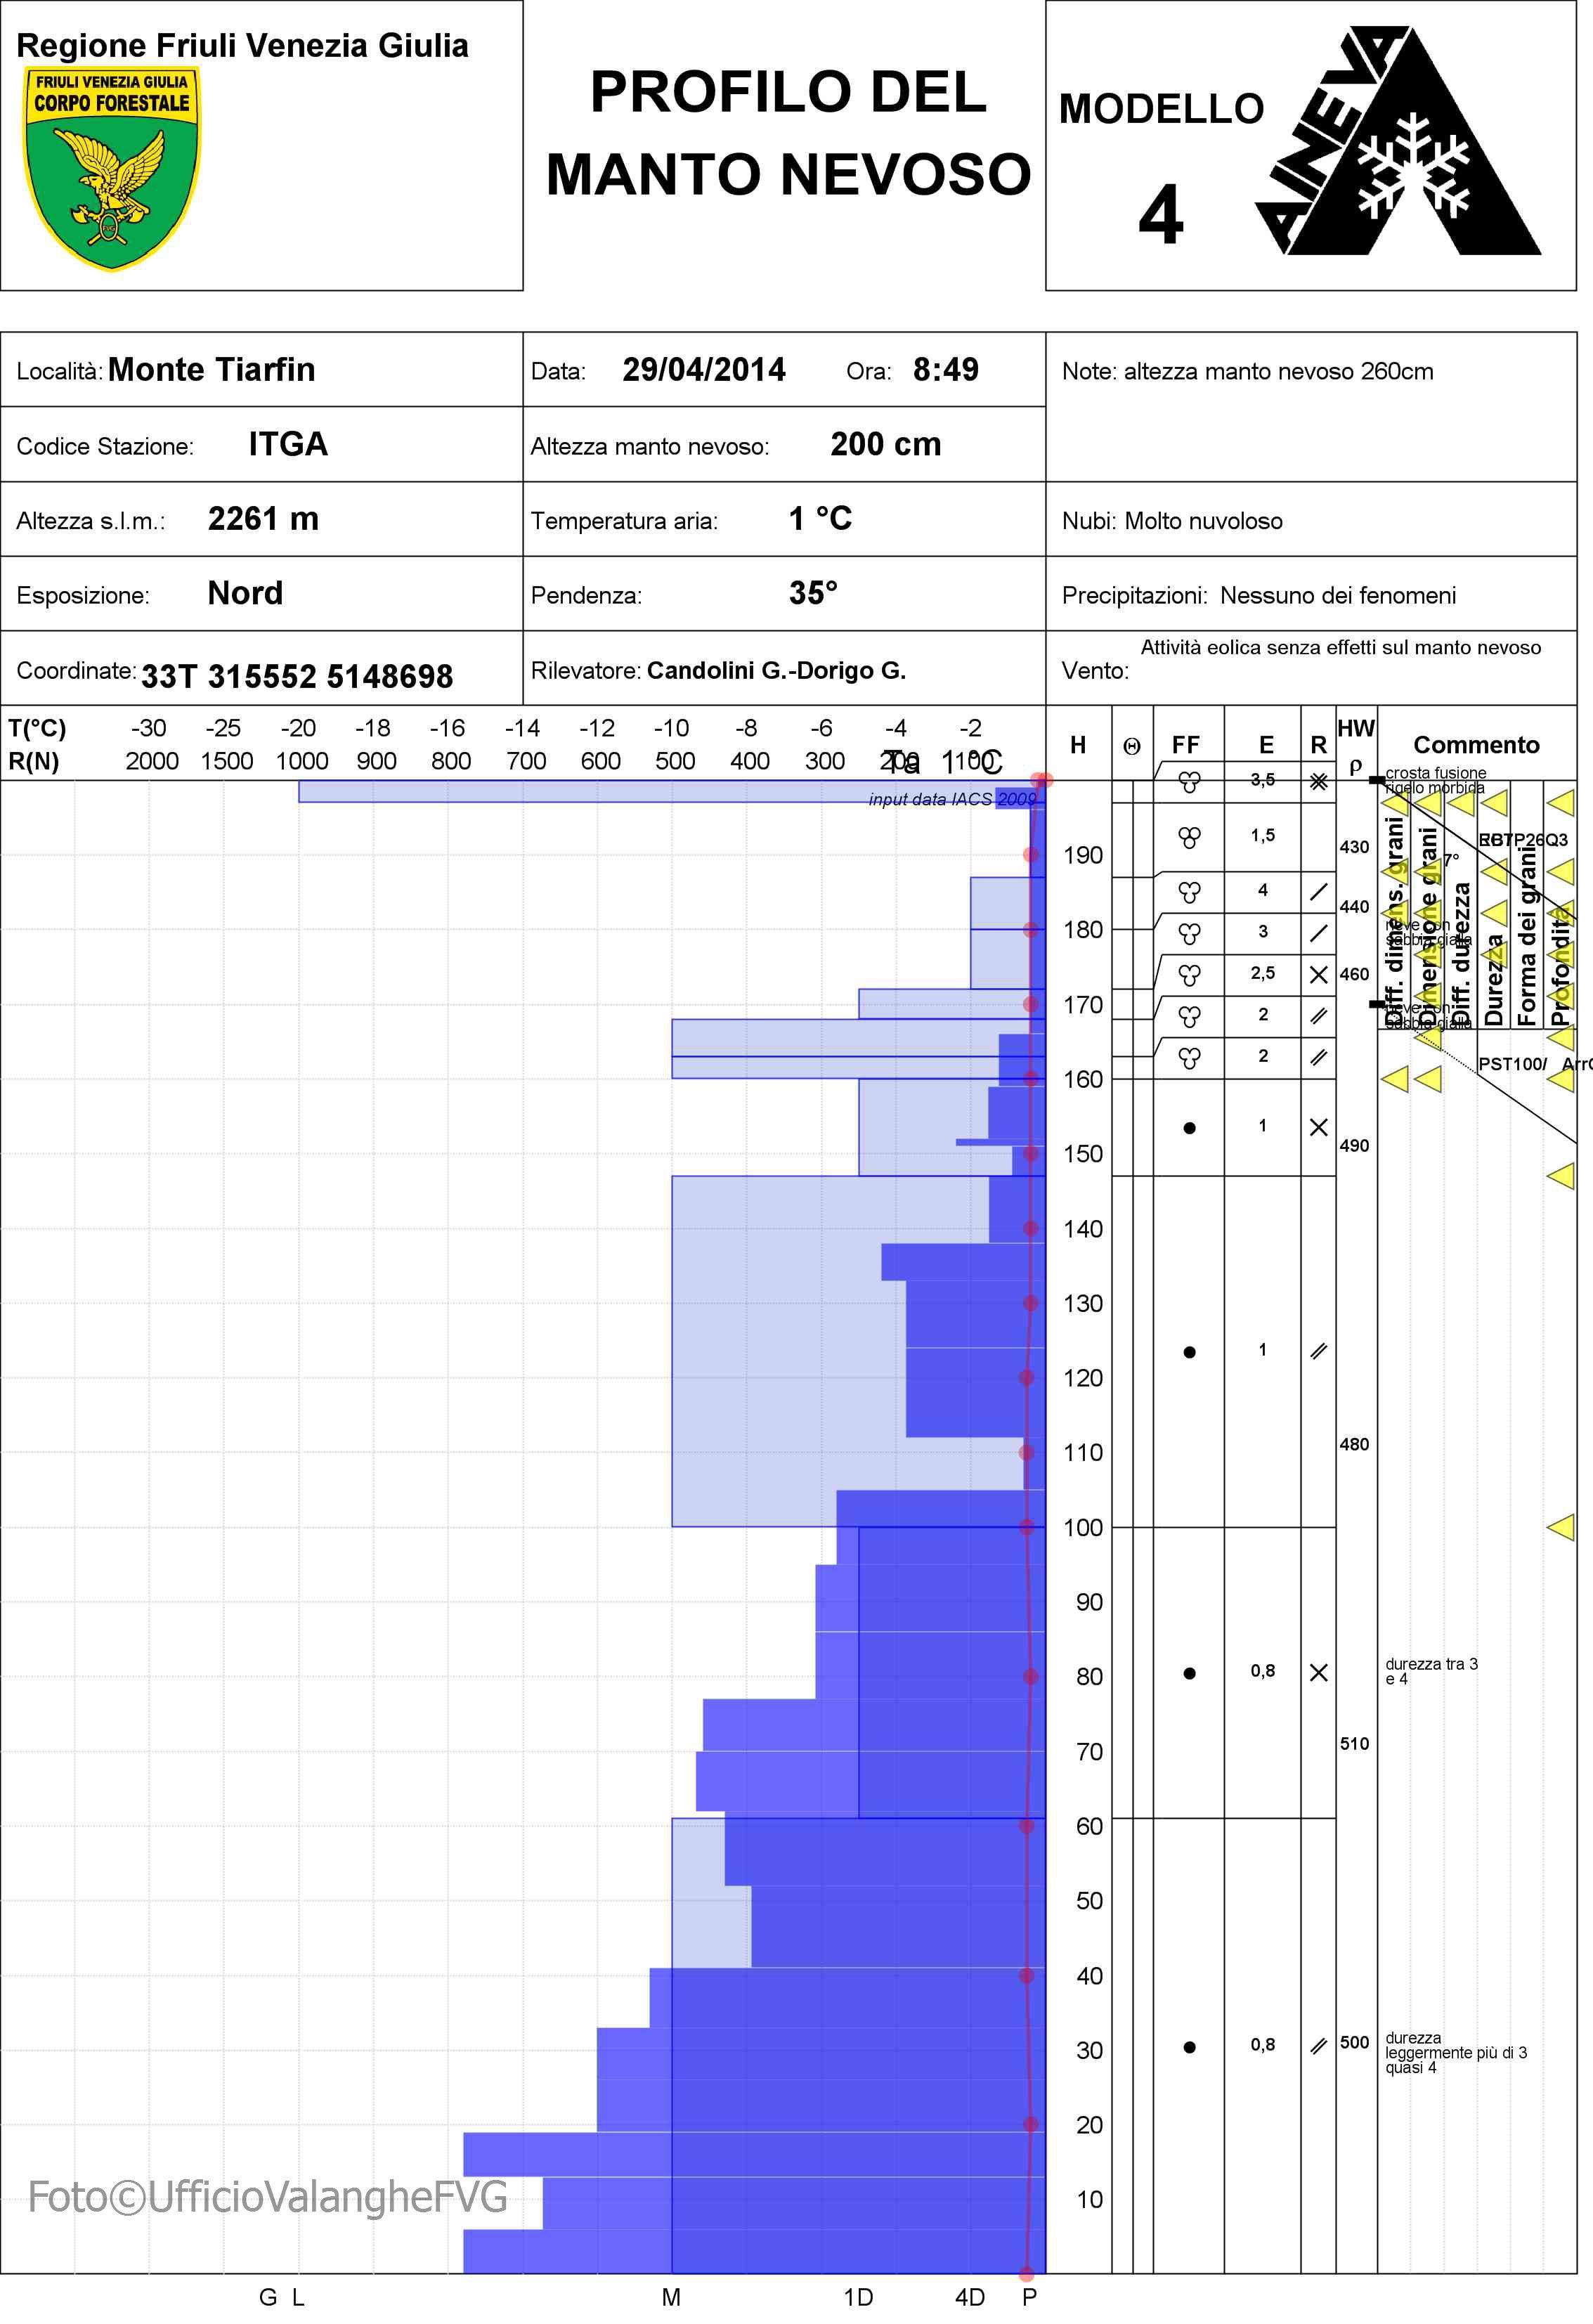 profilo primaverile tiarfin 29-04-14.jpg.JPG